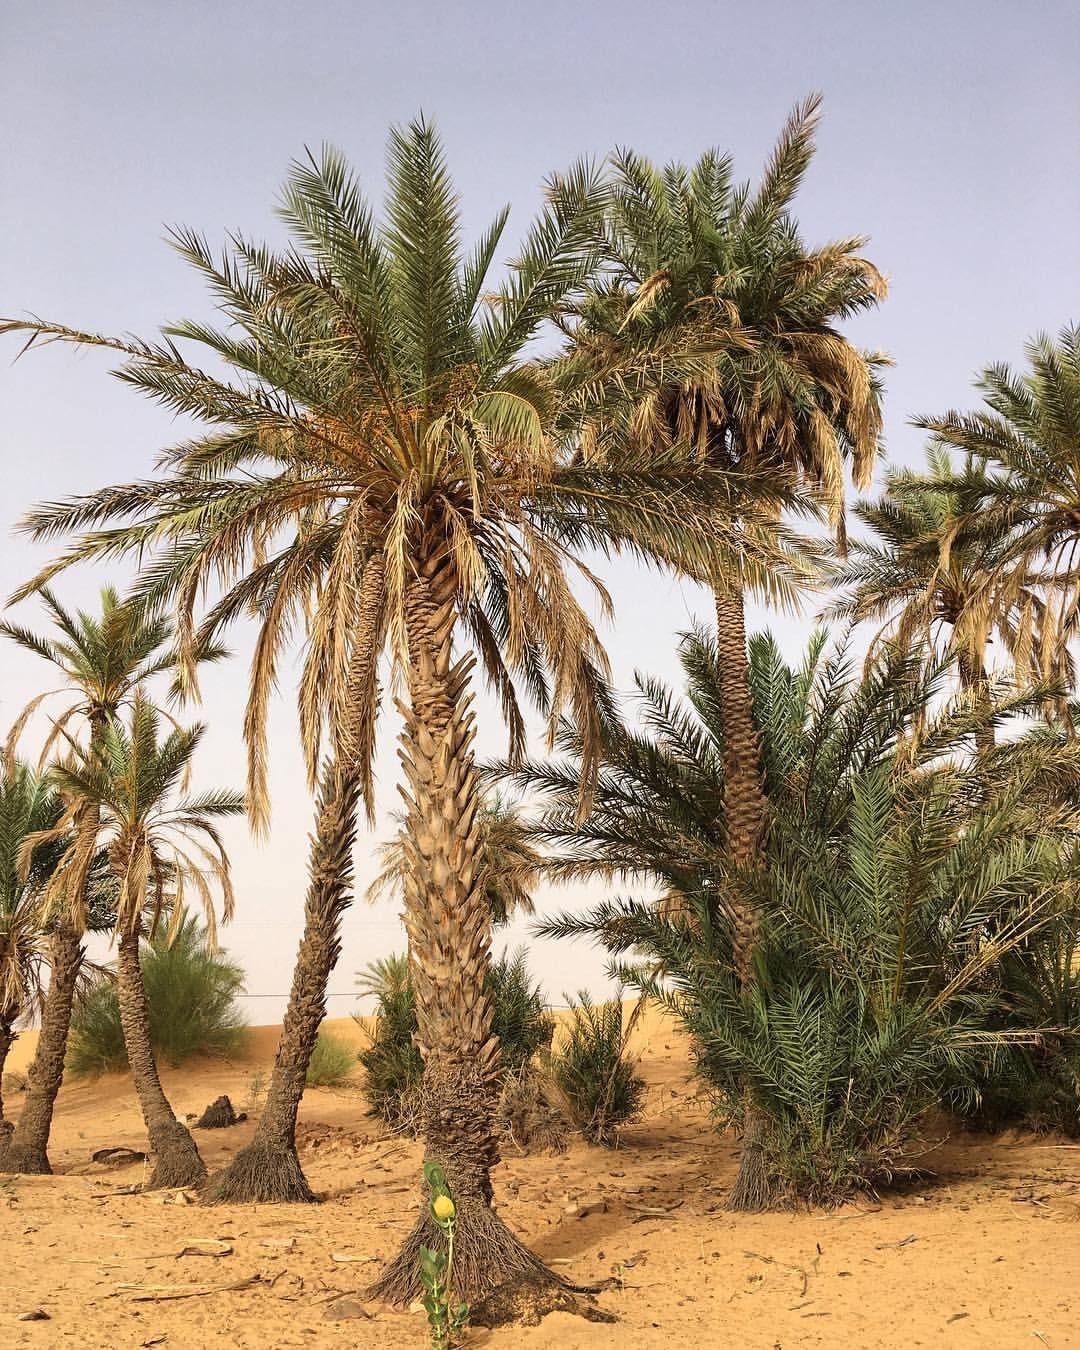 Palmerie Tidjikja Mauritania Africa Westafrica Mauritania Tagant Tidjikja Palmerie Dates Travelafr Africa Travel Cool Places To Visit Nouakchott